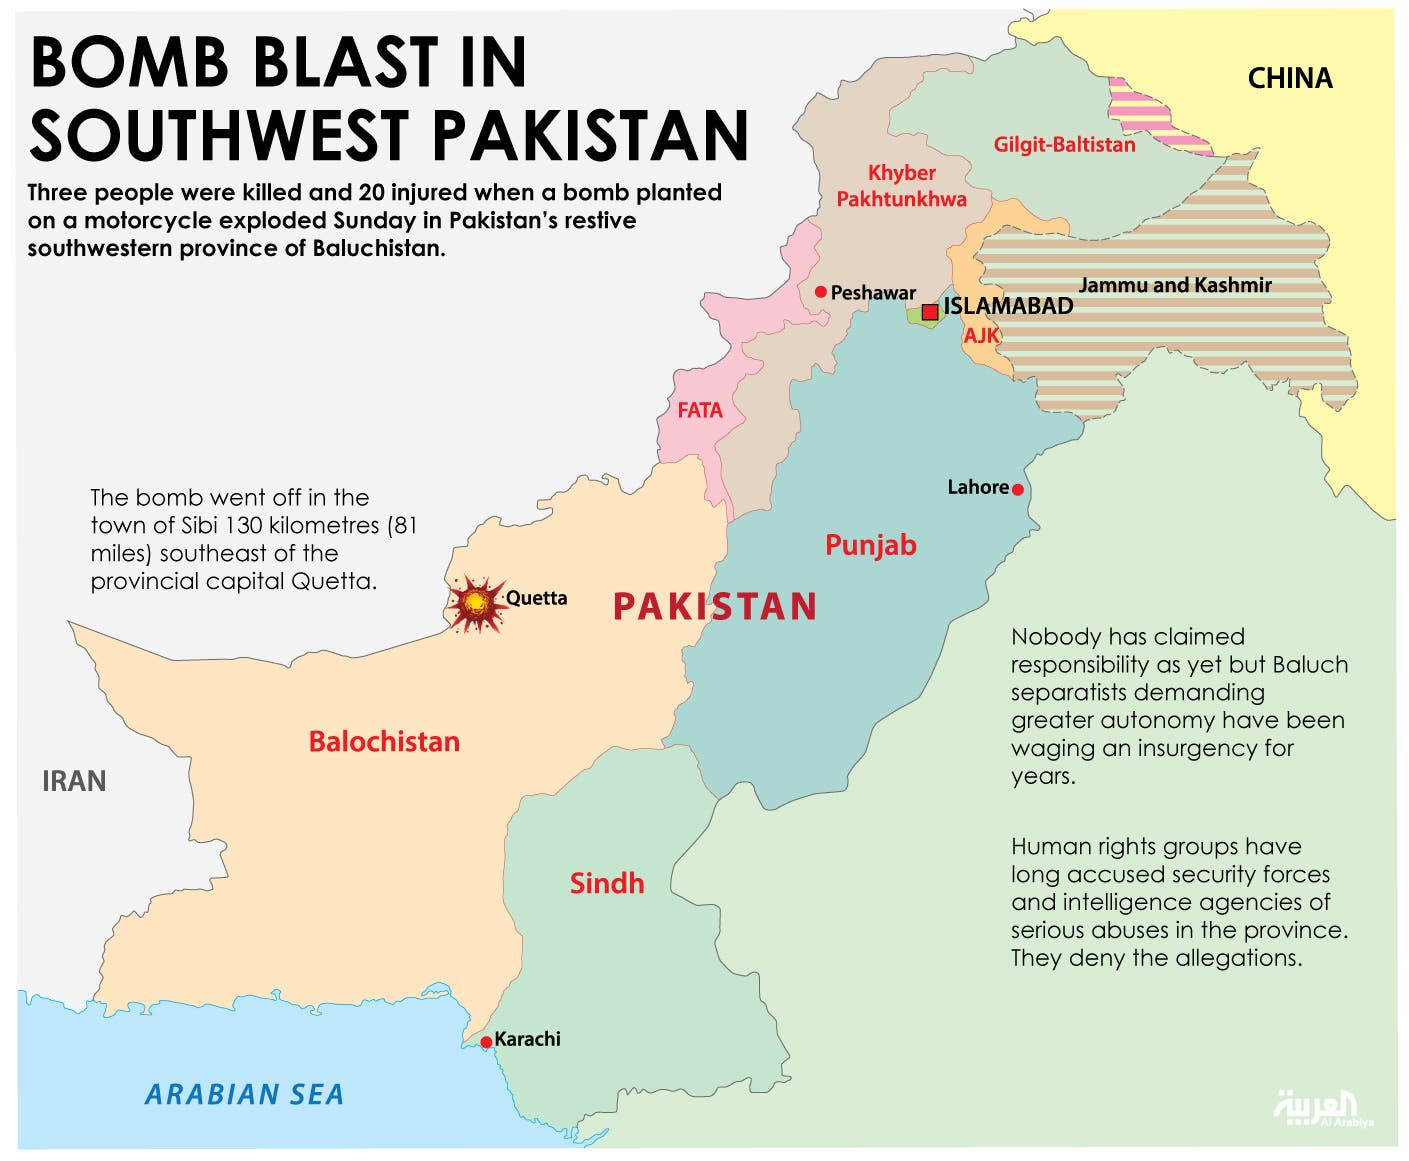 Infographic: Bomb blast in southwest Pakistan